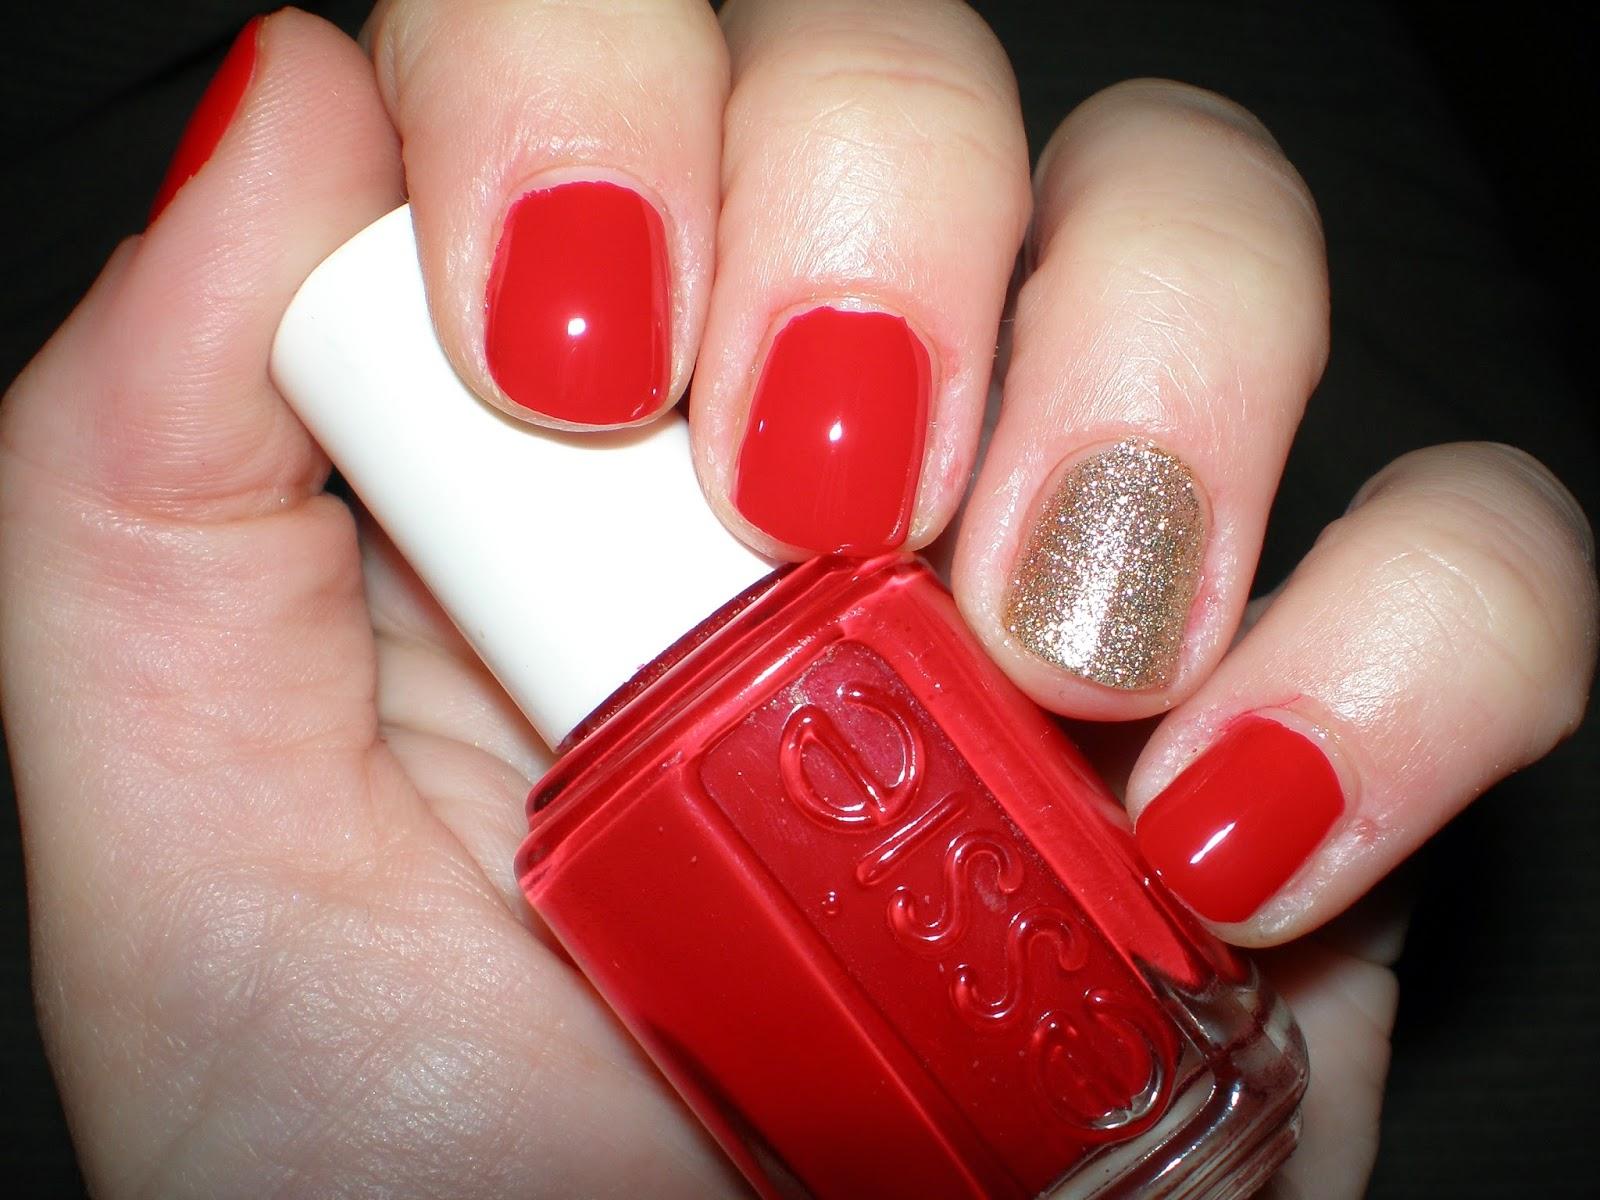 Essie nail polish in Pouf Daddy